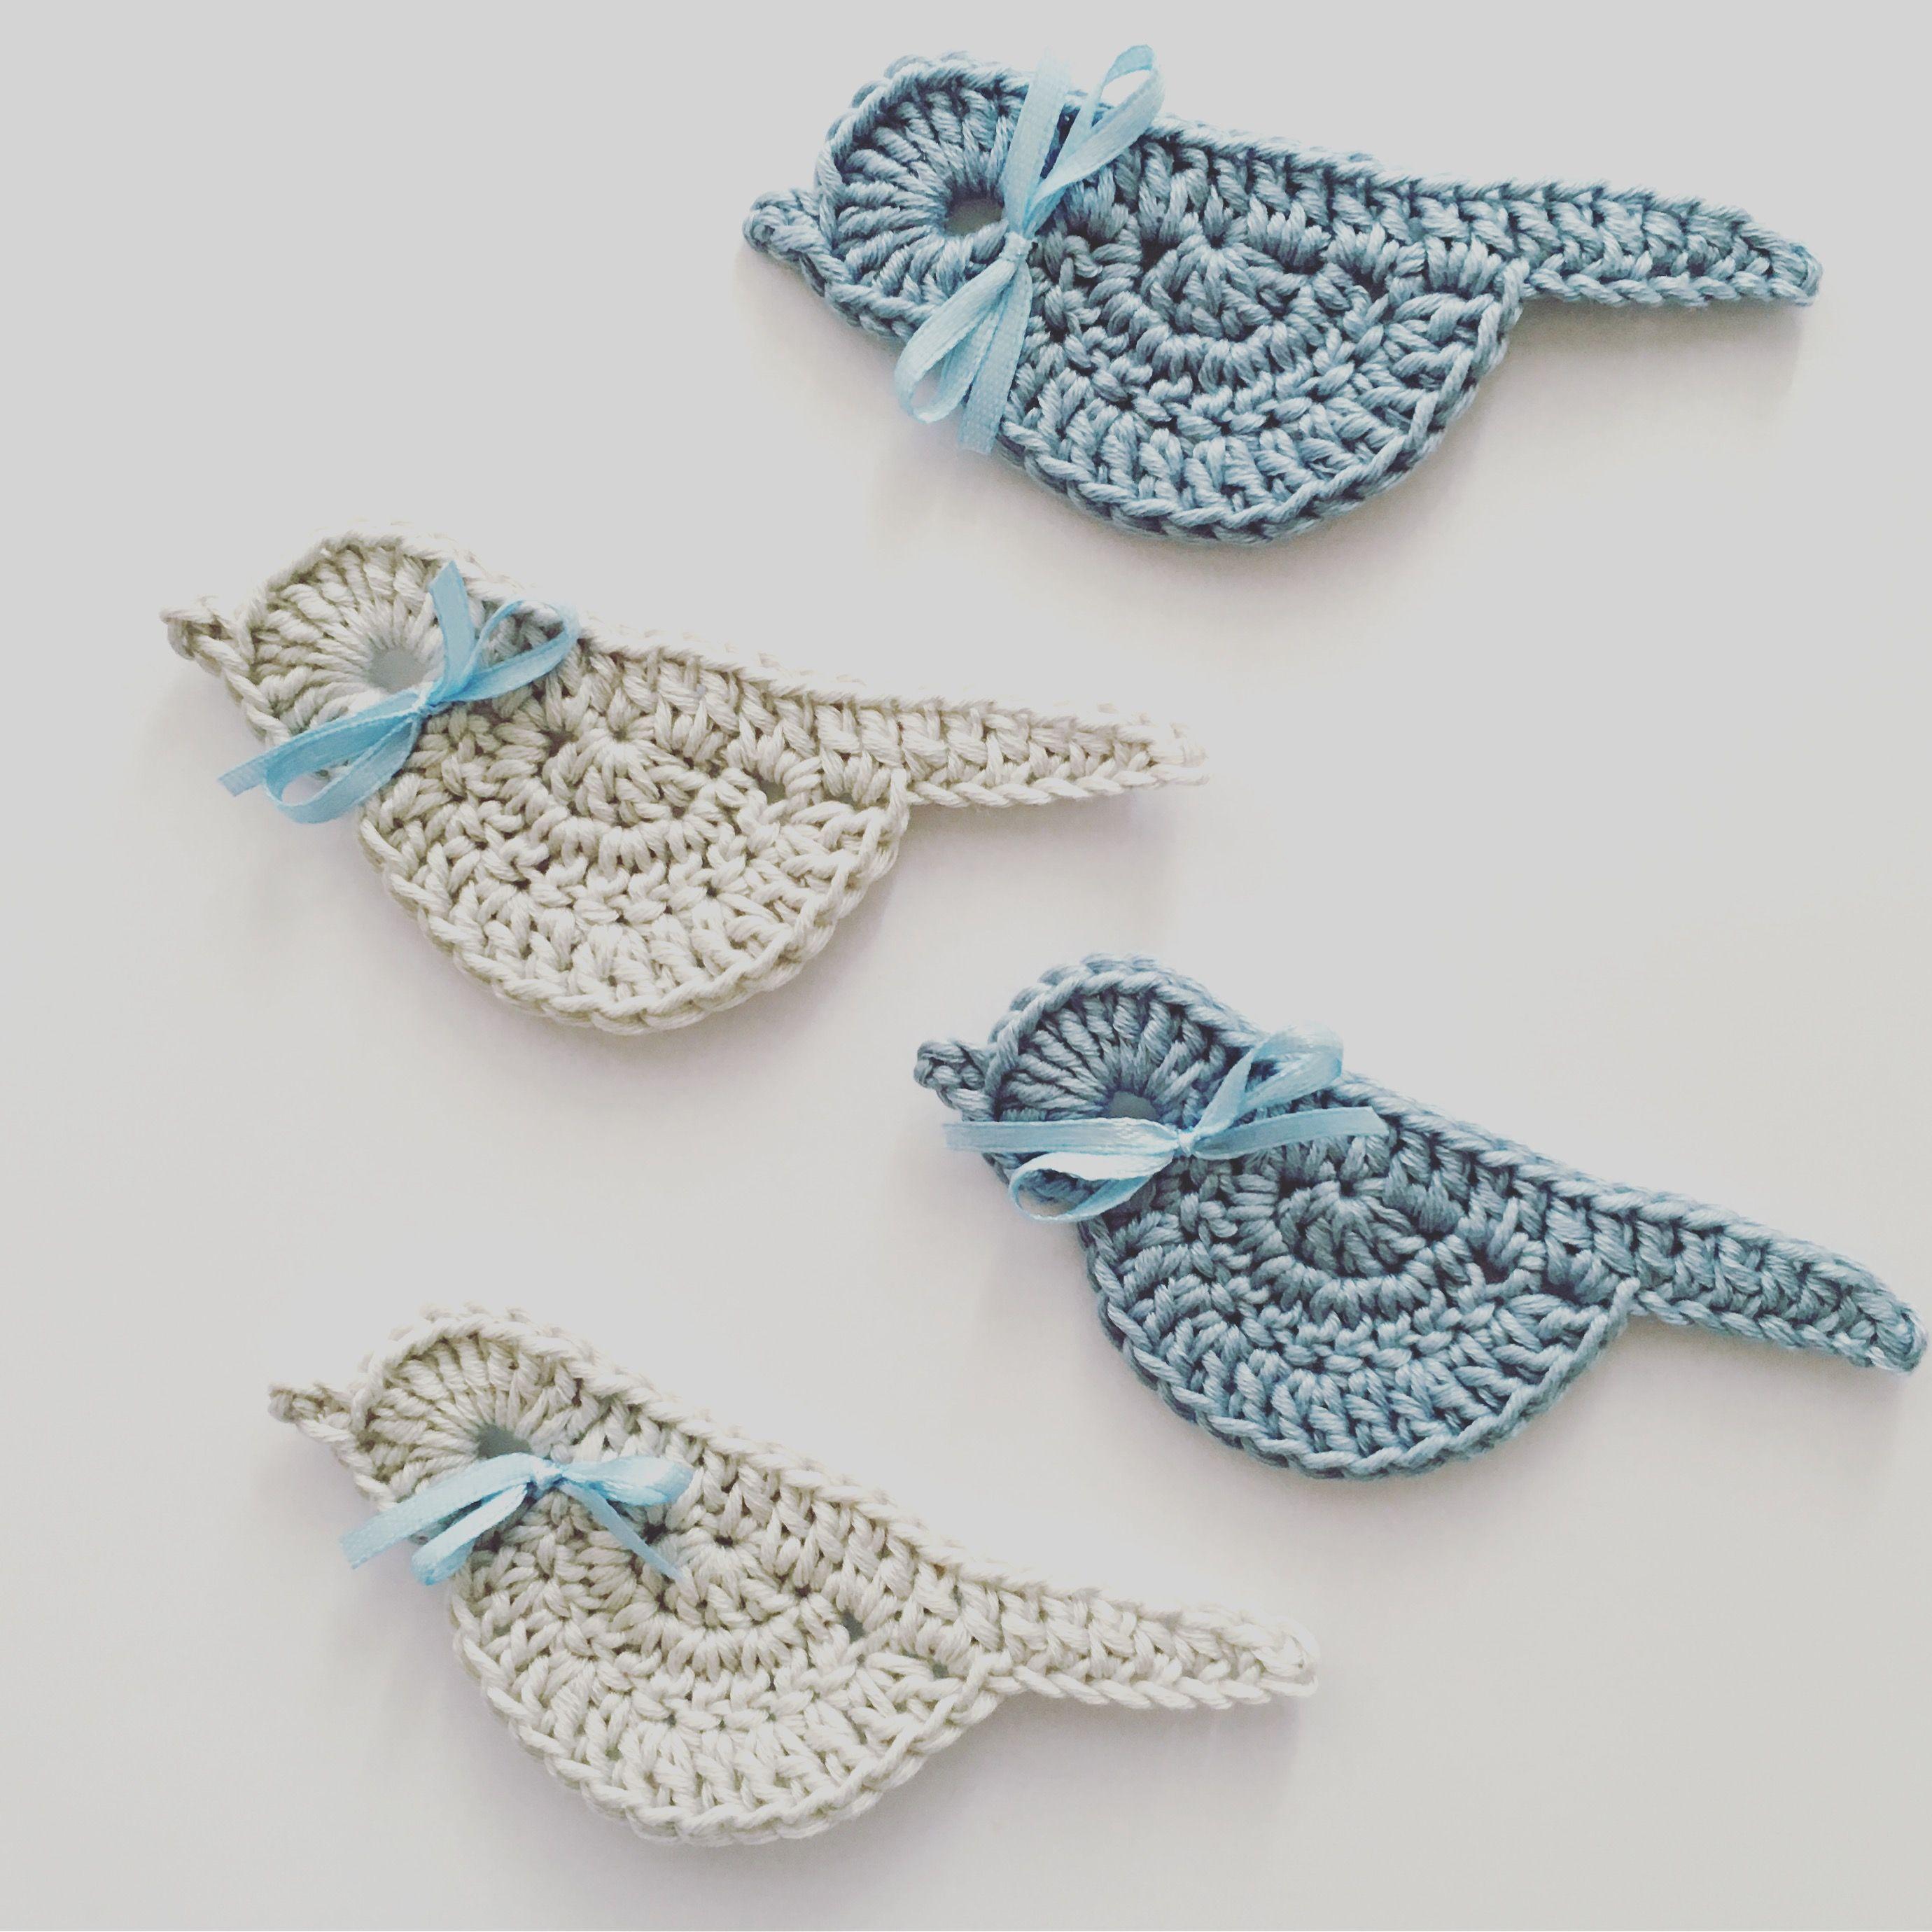 Vogel häkeln | Made by crochet | Pinterest | Vögel häkeln, Vogel und ...